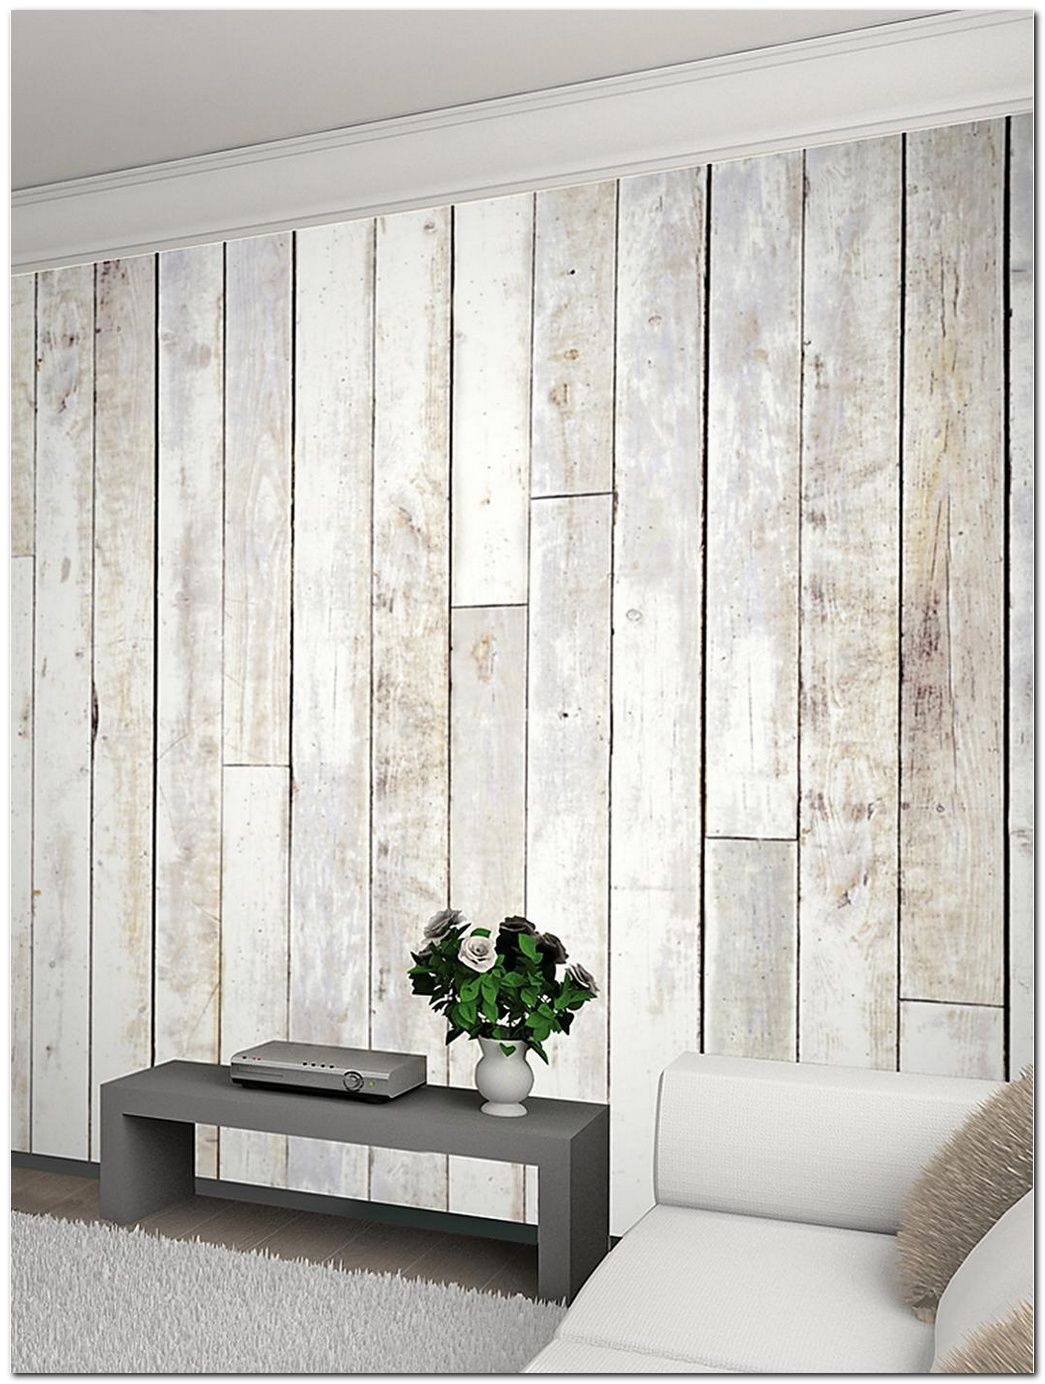 DIY Laminate Flooring on Walls and 30 Inspirations Unique 1045x1384